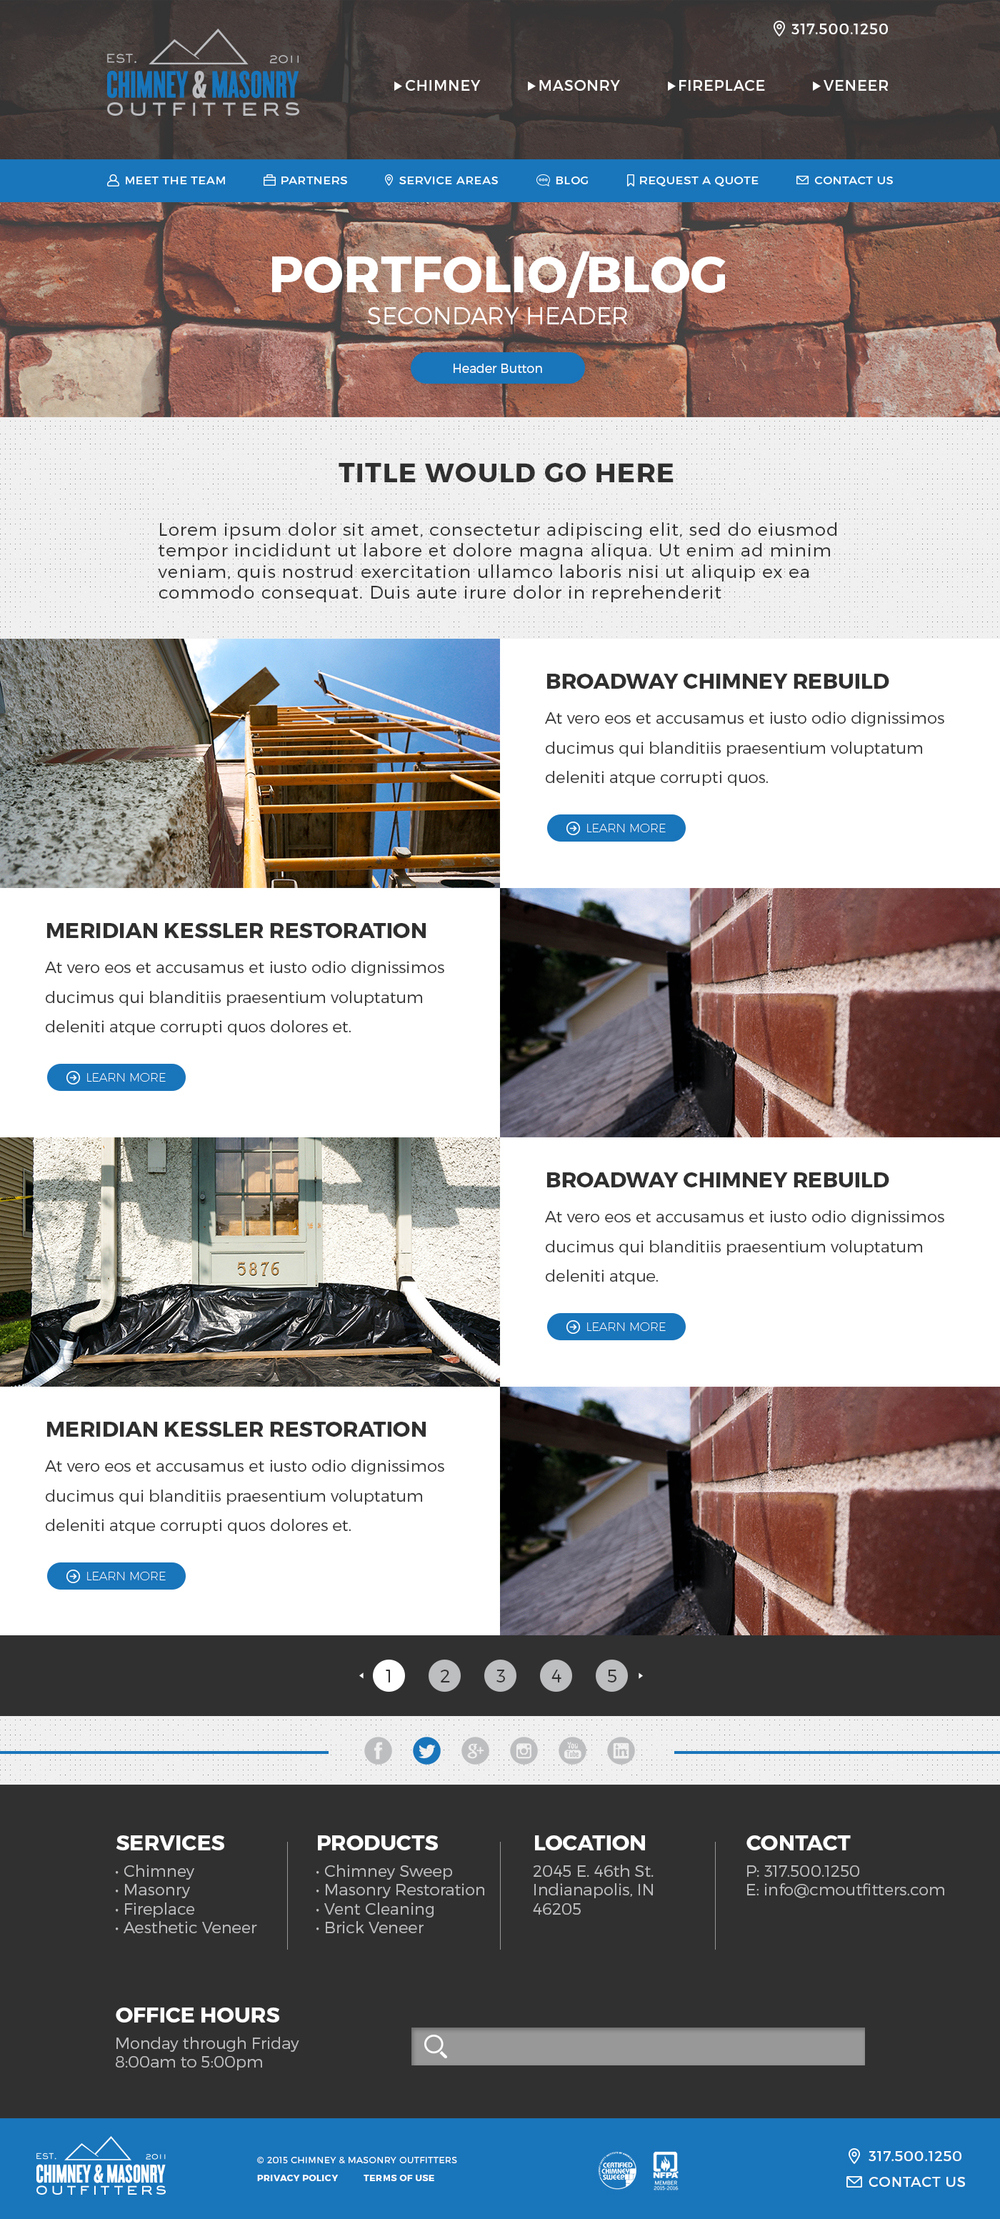 CMO-WebsiteDesign-SecondaryPage-Portfolio_Blog.jpg